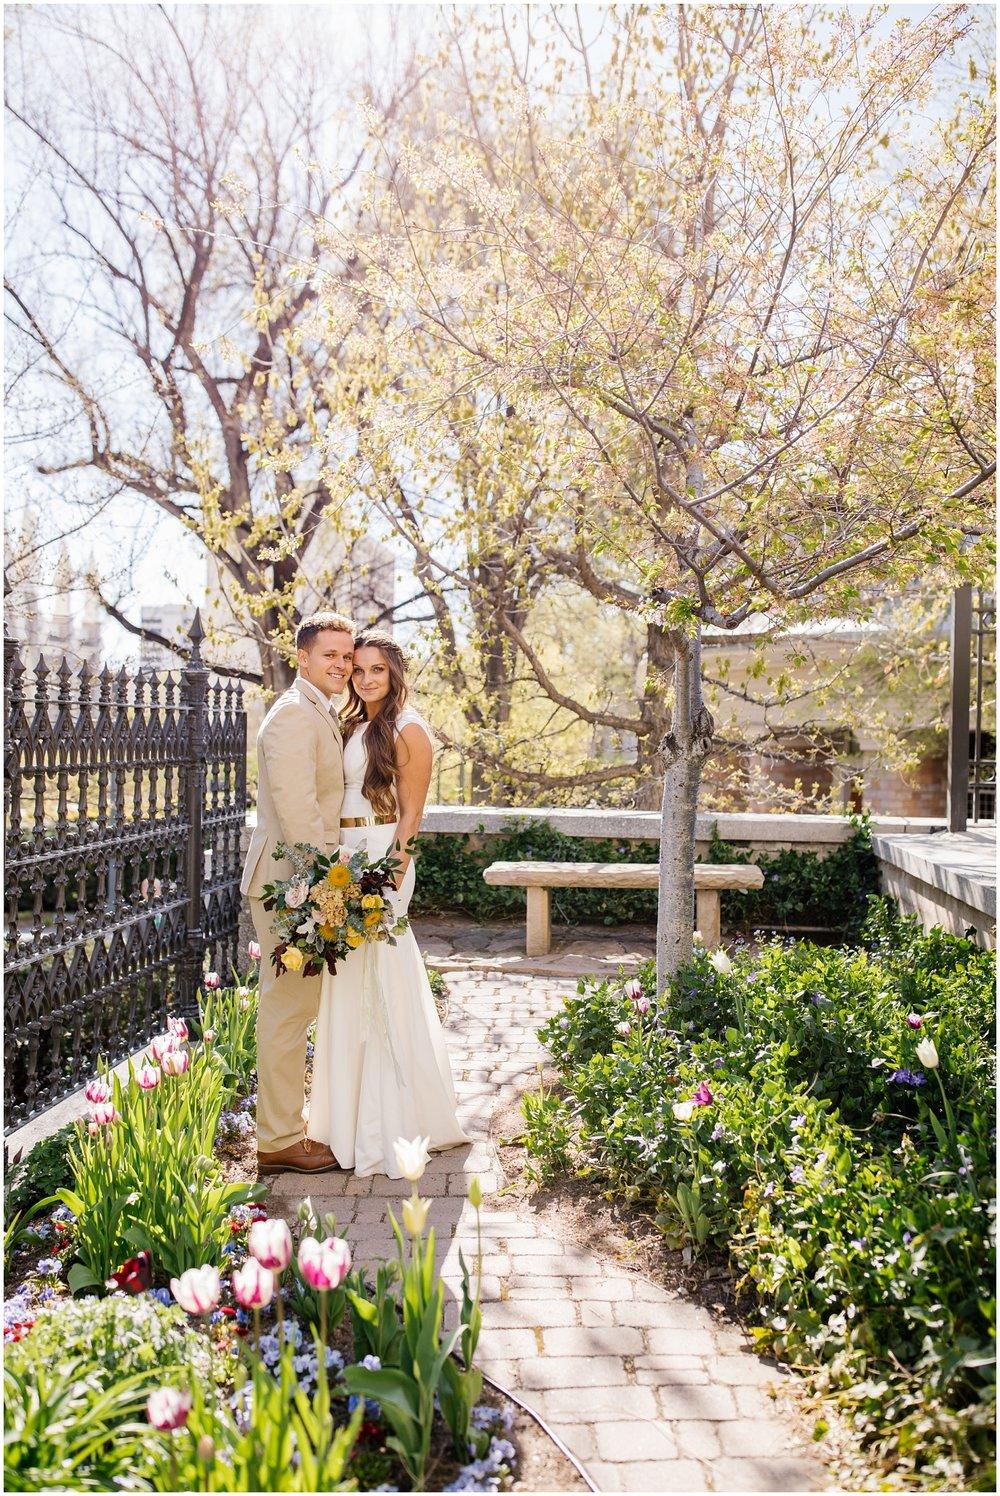 JC-Wedding-179_Lizzie-B-Imagery-Utah-Wedding-Photographer-Park-City-Salt-Lake-City-Temple-Joseph-Smith-Memorial-Building-Empire-Room.jpg